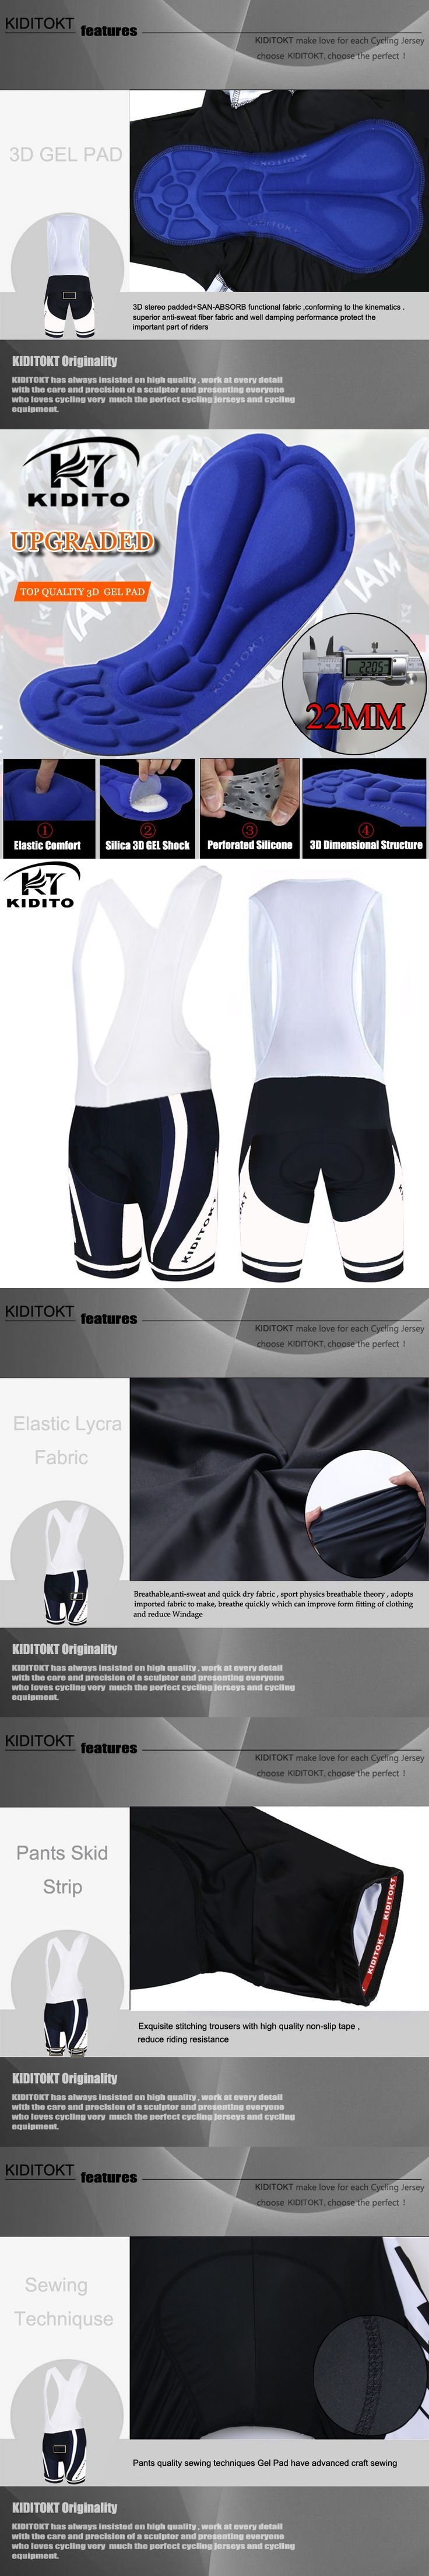 KIDITOKT Shamus 100% Lycra Cycling Bib Shorts Summer Coolmax 3D Gel Pad Bike Bib Tights Mtb Ropa Ciclismo Wicking Bicycle Pants